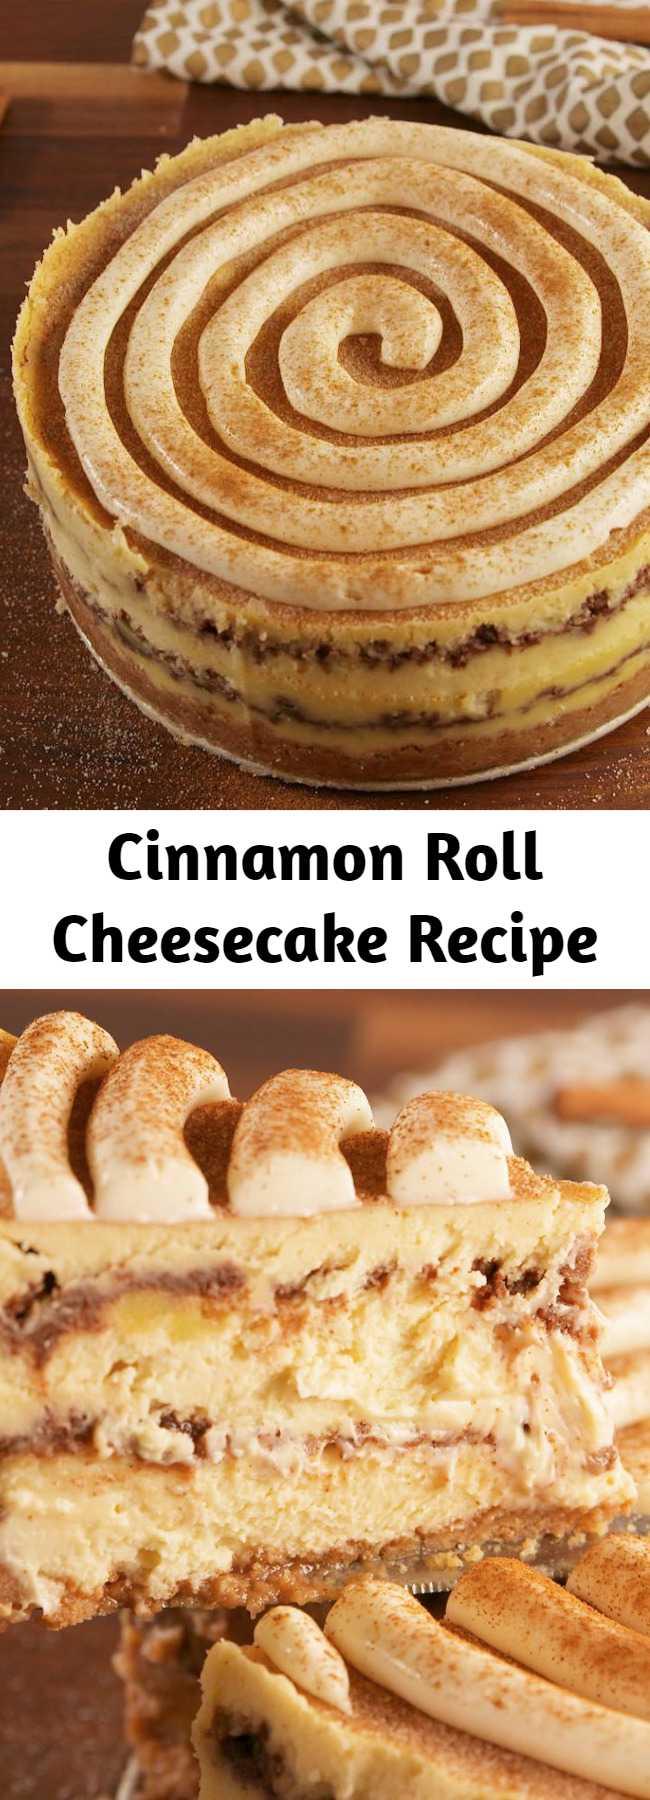 Cinnamon Roll Cheesecake Recipe - The inside of this cheesecake though. #easyrecipe #dessert #cheesecake #baking